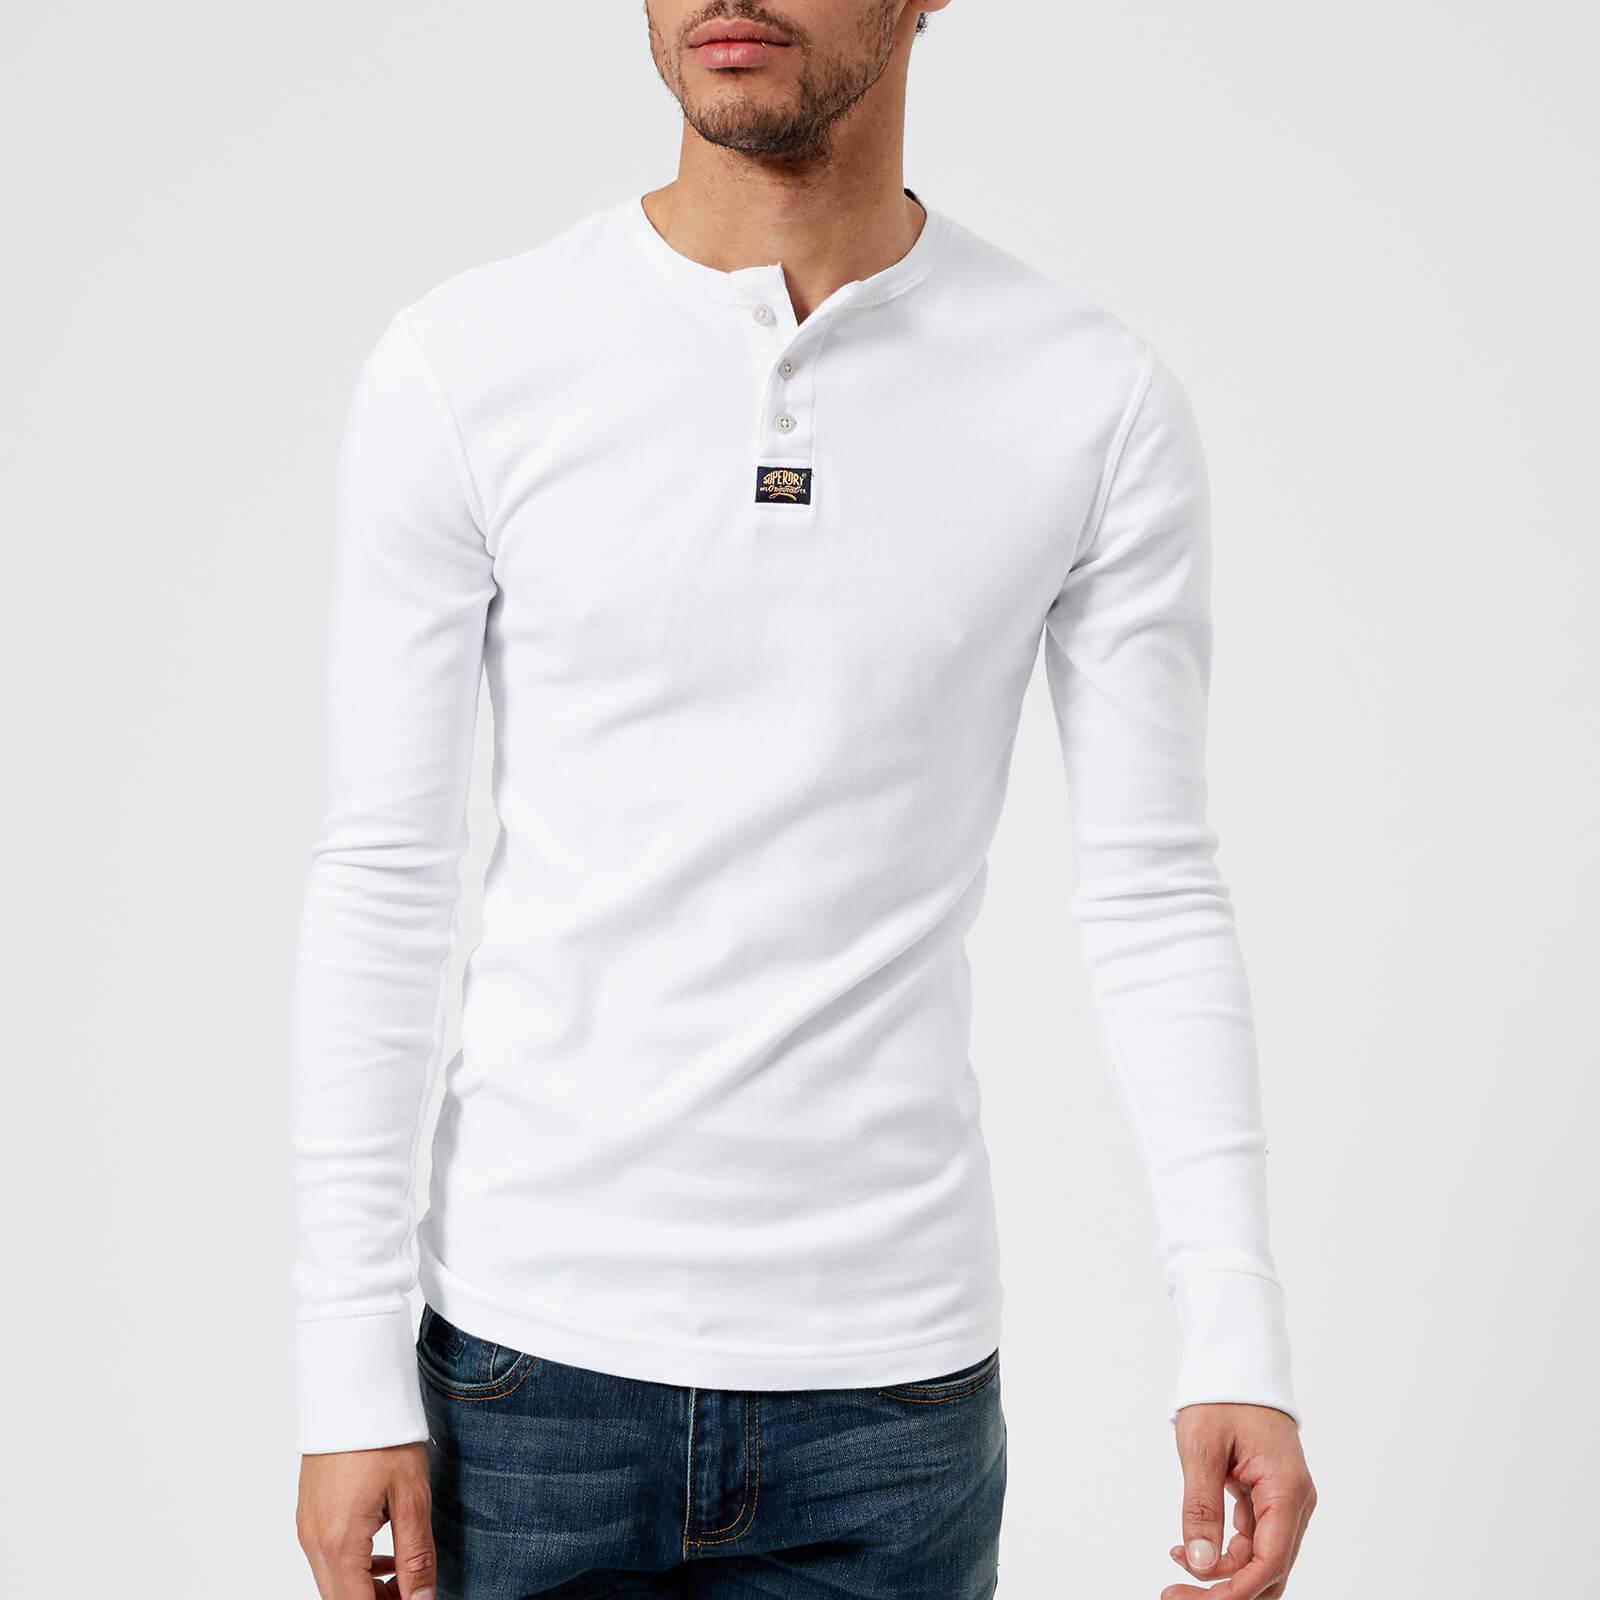 eabf7cd17d14 Superdry Heritage Long Sleeve Grandad Henley T-shirt In White in ...